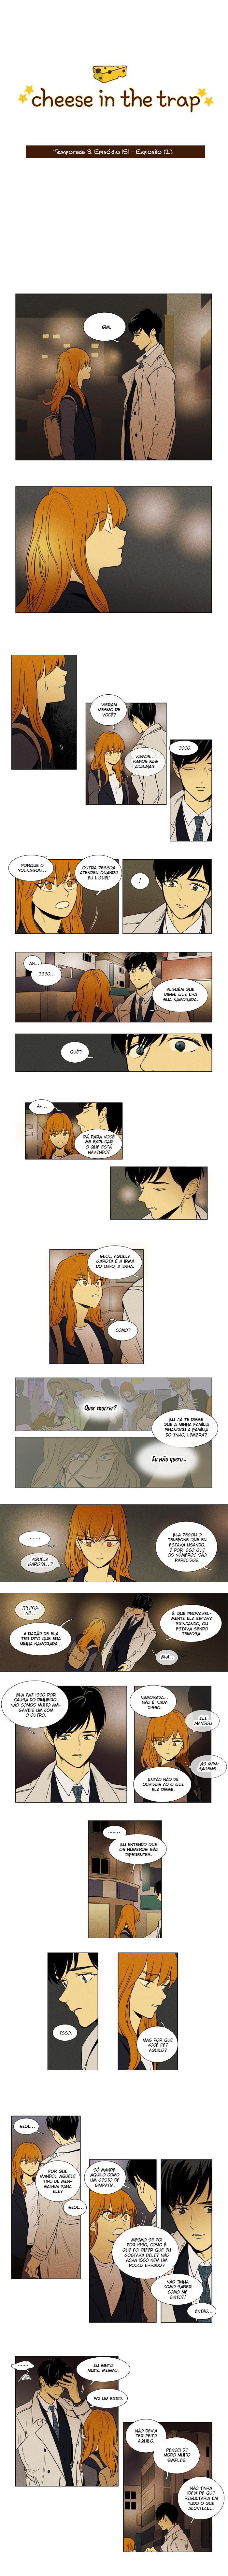 https://nine.mangadogs.com/br_manga/pic/54/2806/6434495/CheeseintheTrap151_0_117.jpg Page 1